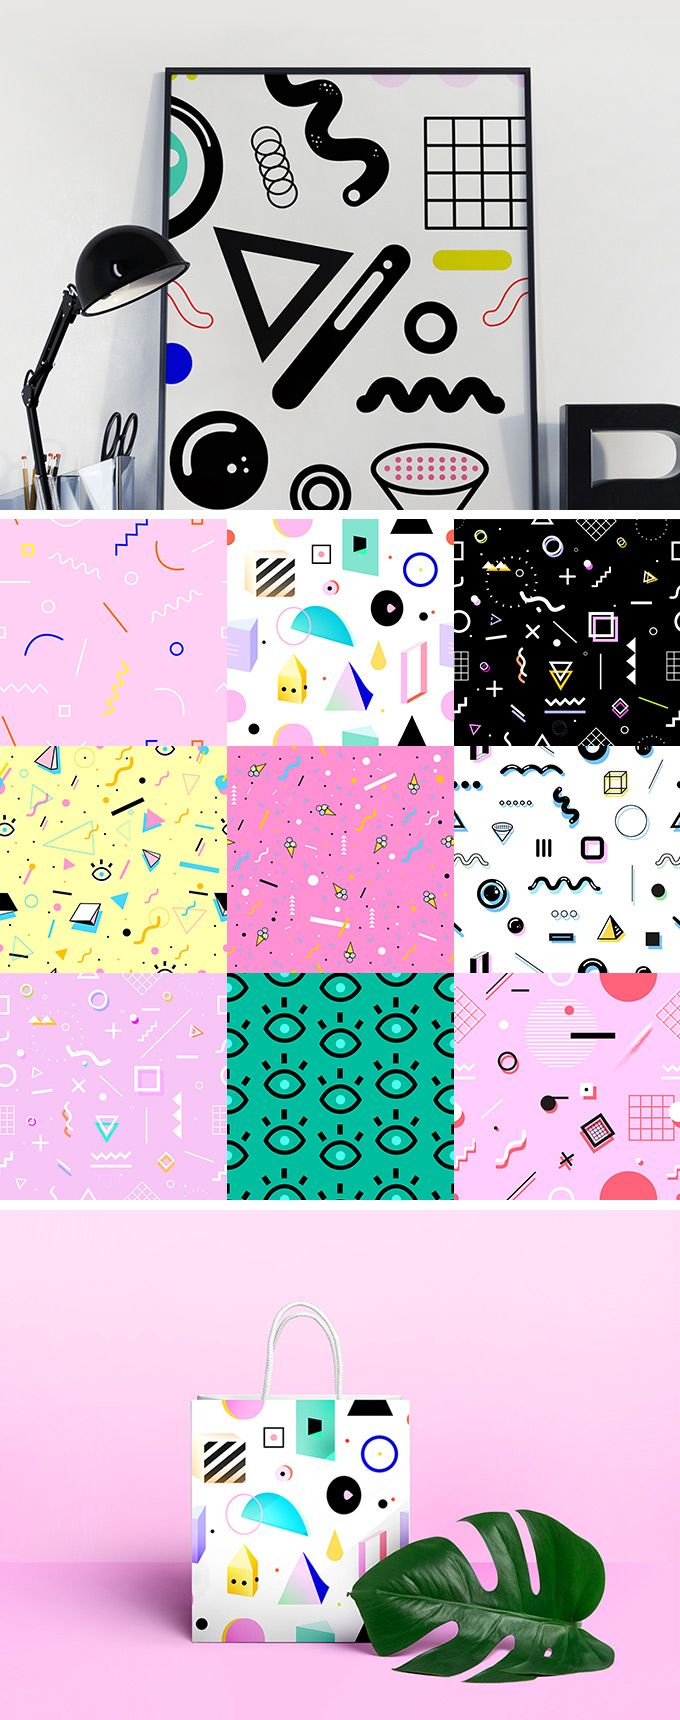 Geometric 80's Style Patterns - download freebie by PixelBuddha